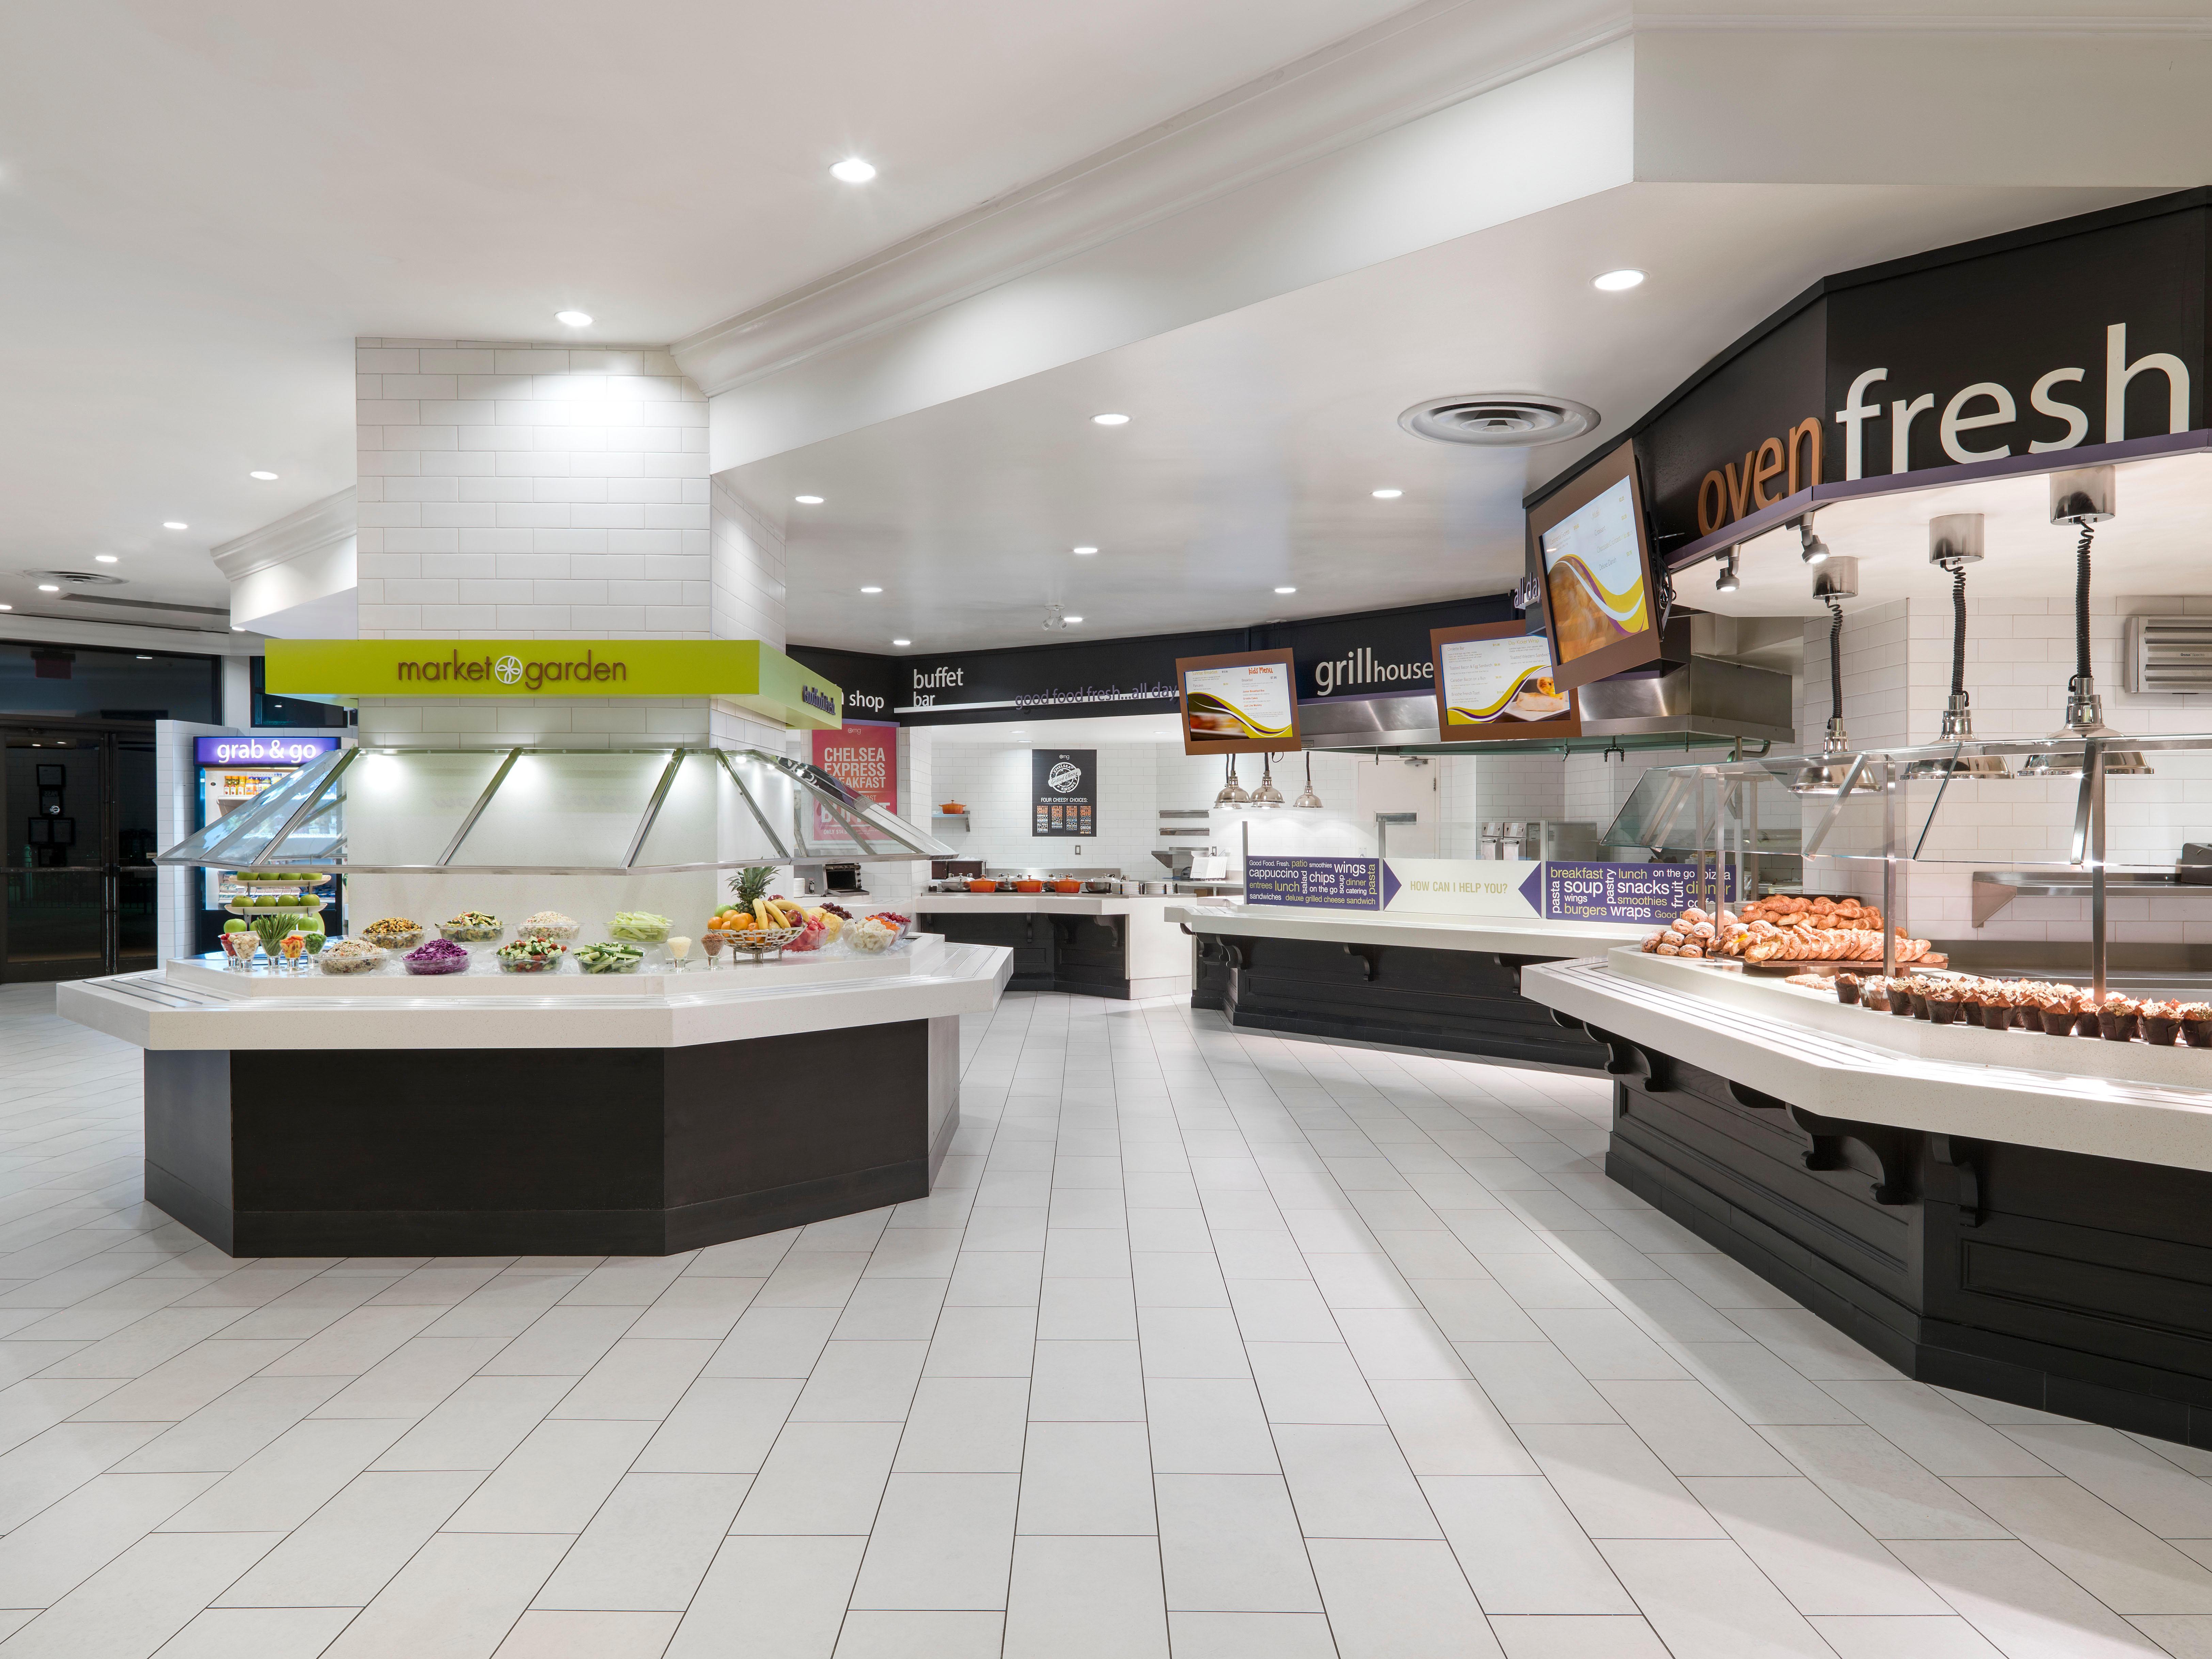 CHELSEA HOTEL, TORONTO in Toronto: Market Garden Restaurant